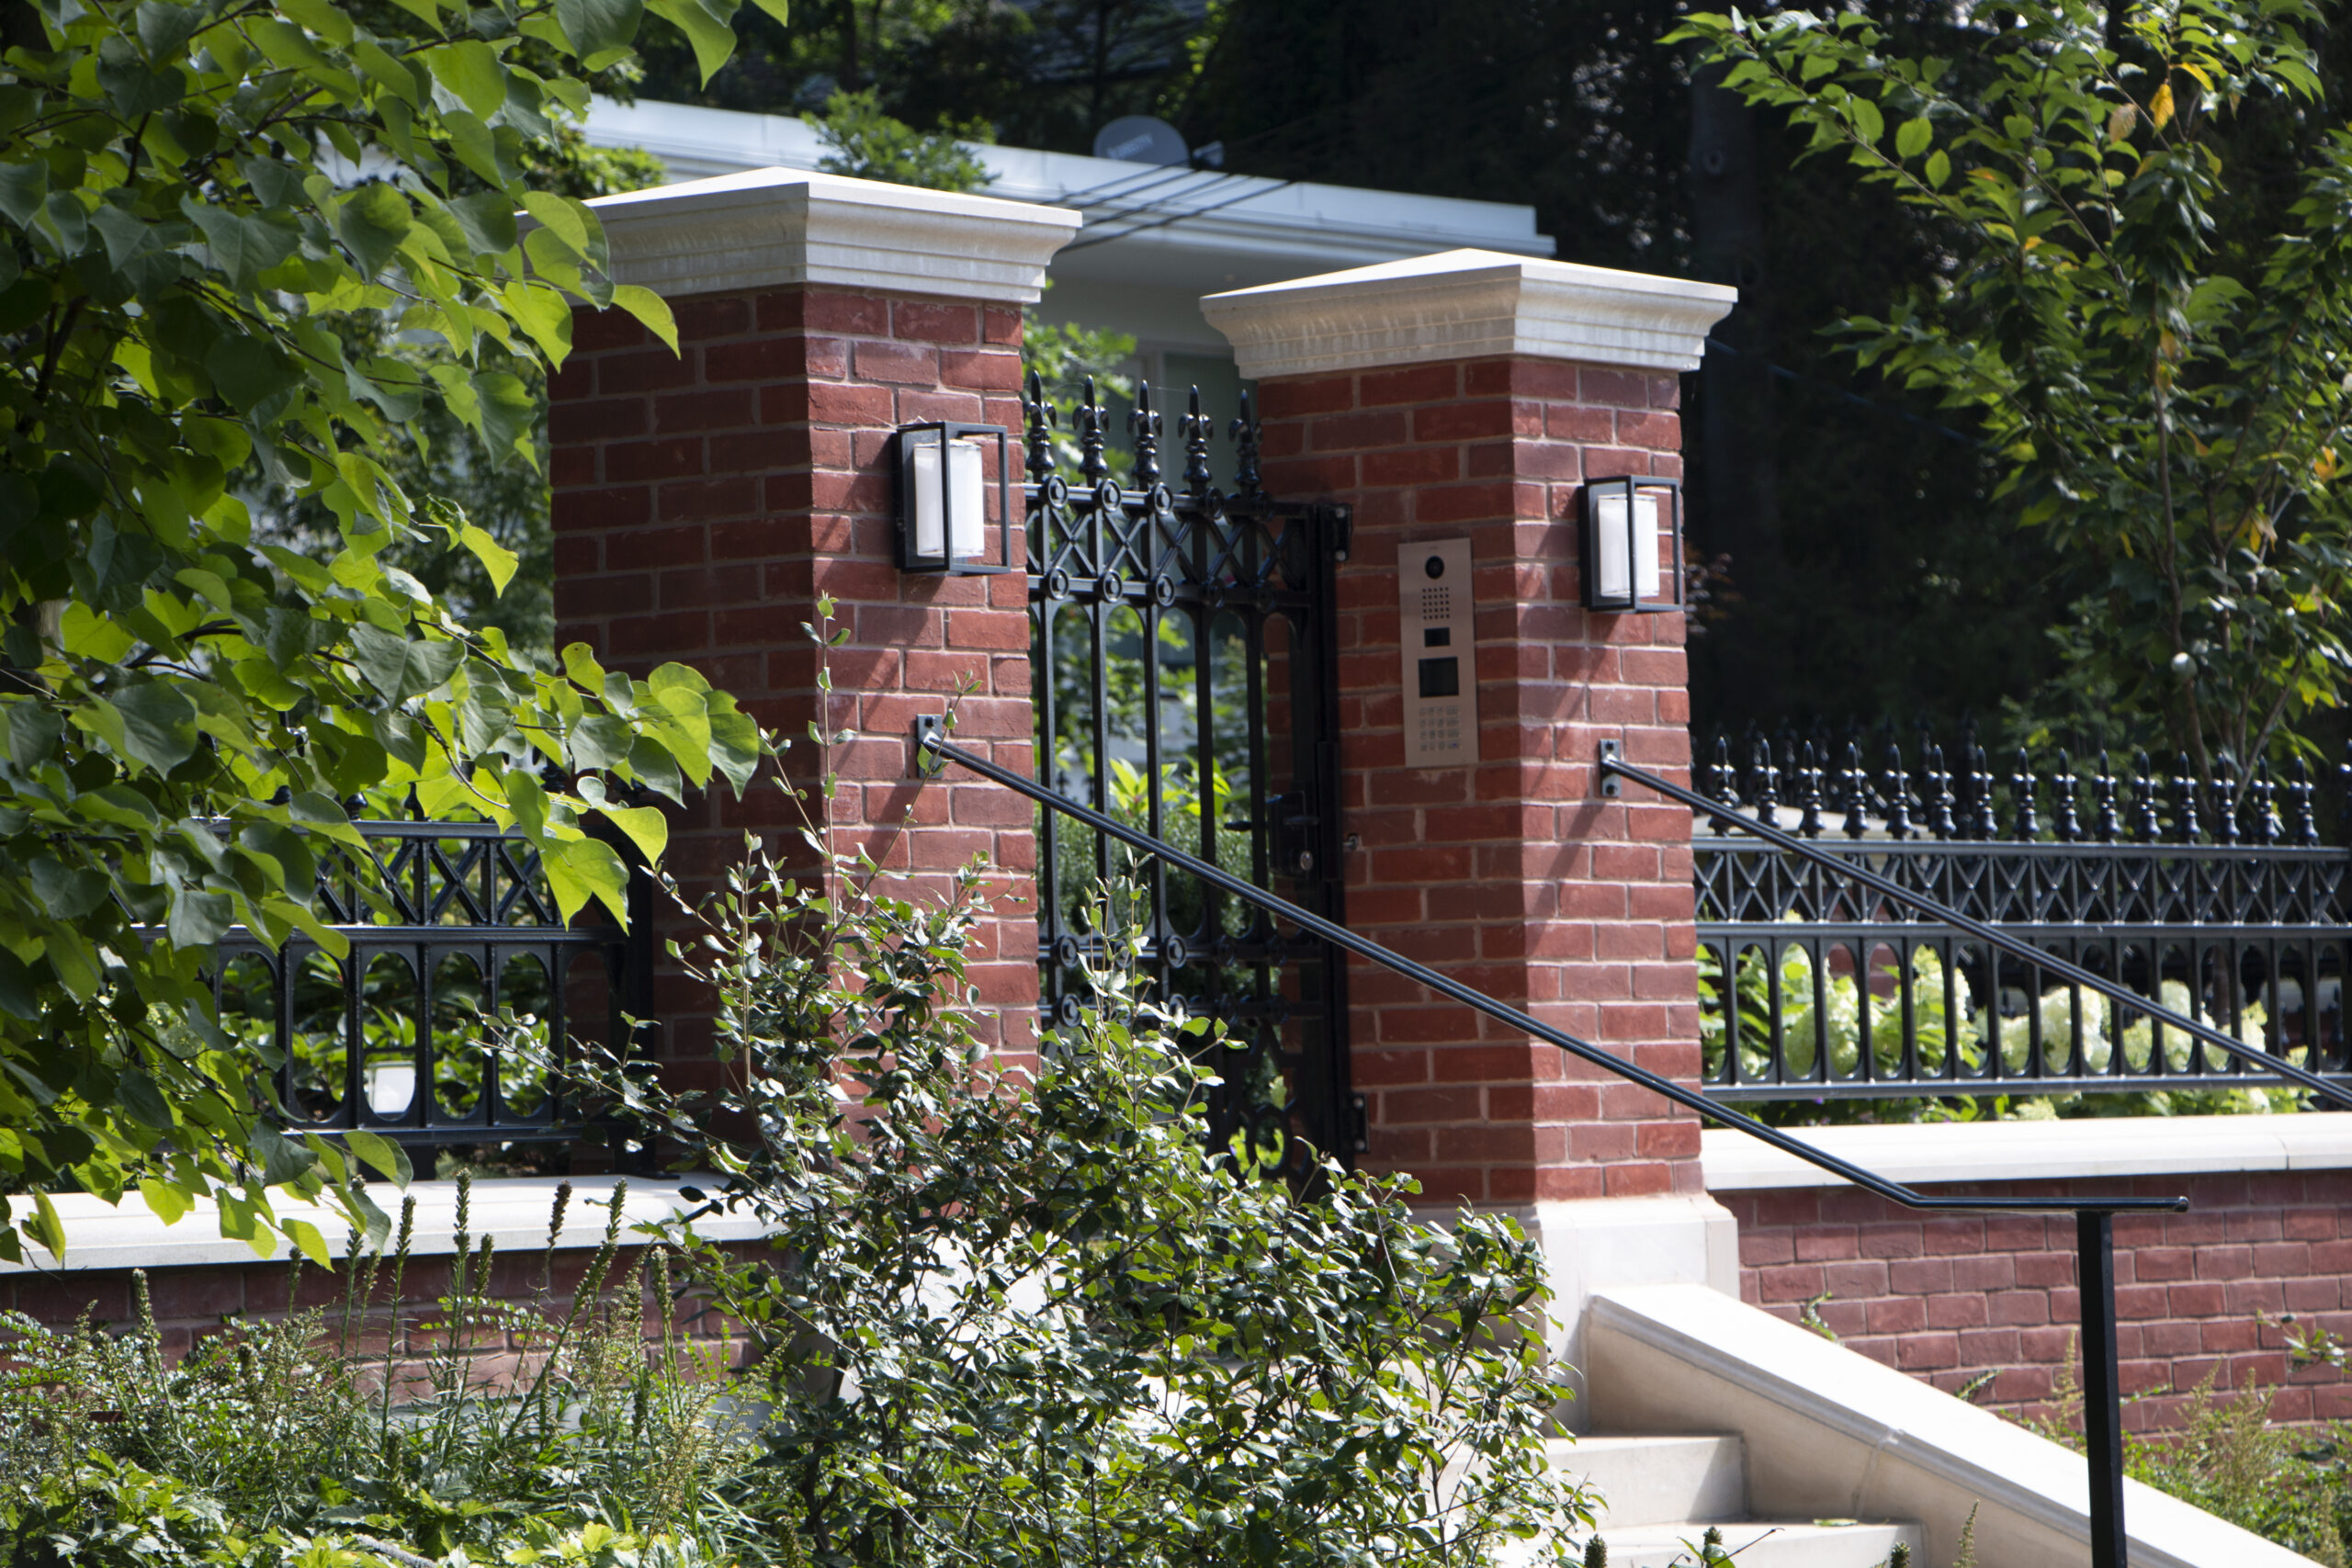 Gate with intercom